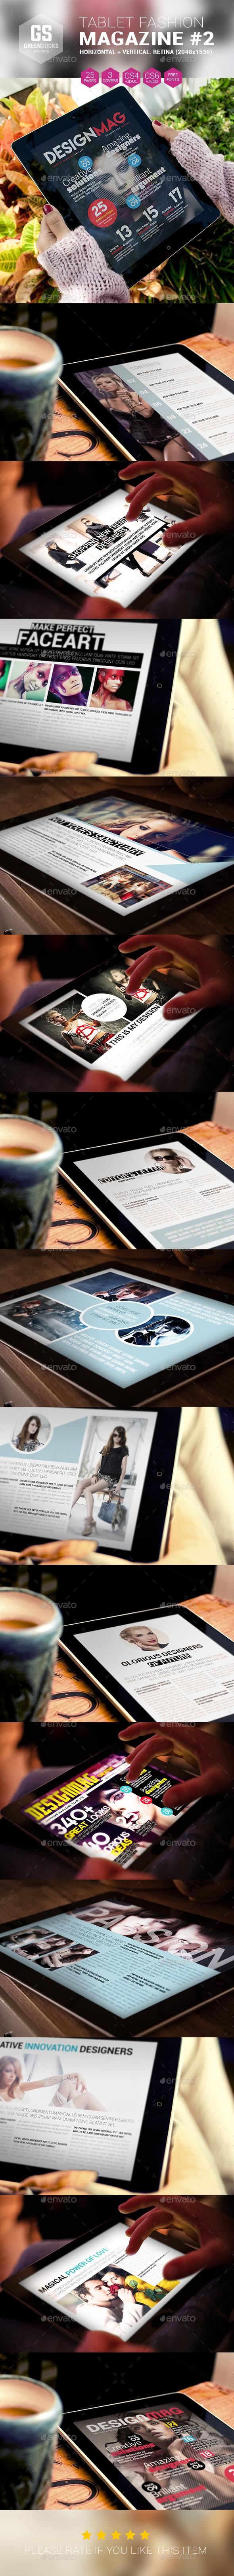 GraphicRiver Tablet Fashion Magazine 9277016